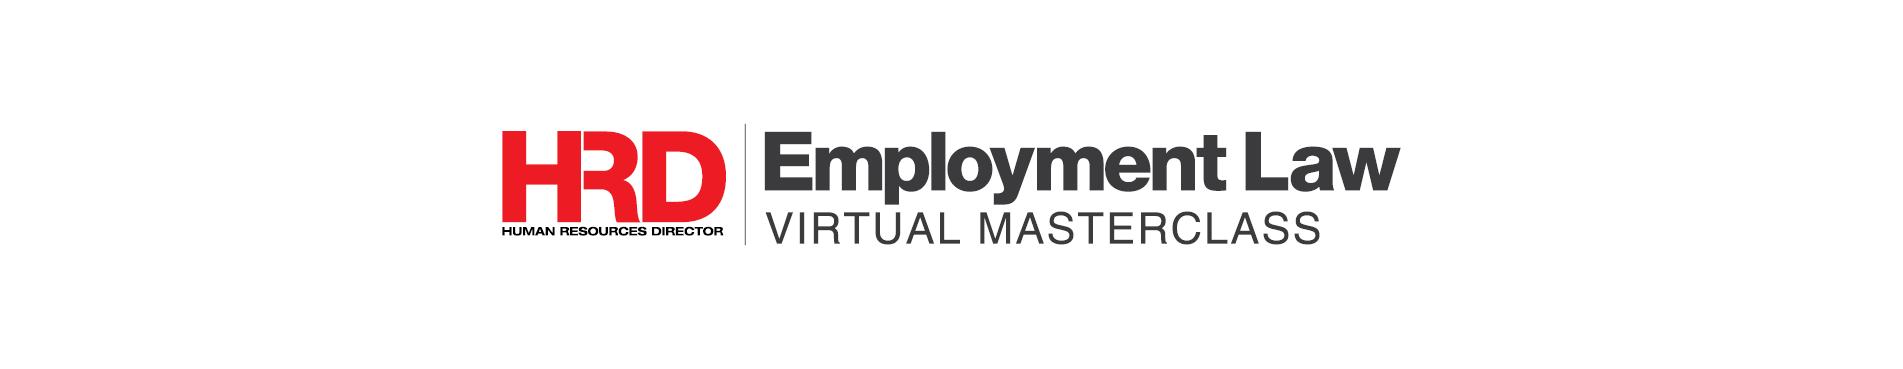 HRD Employment Law Virtual Masterclass